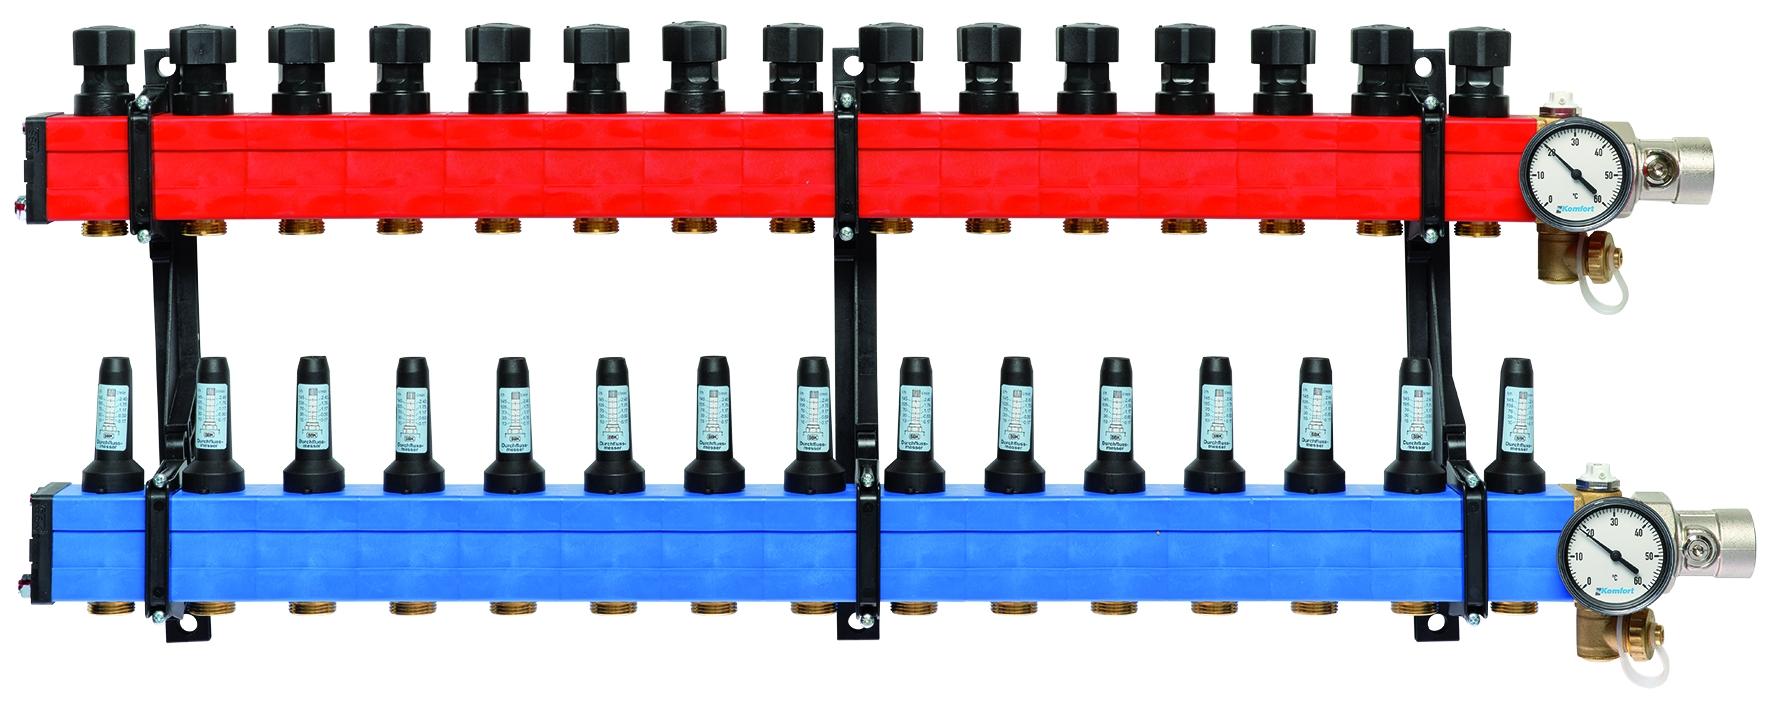 Komfort verdeler type 4010 10 tot 145 l/u., 15-gr.